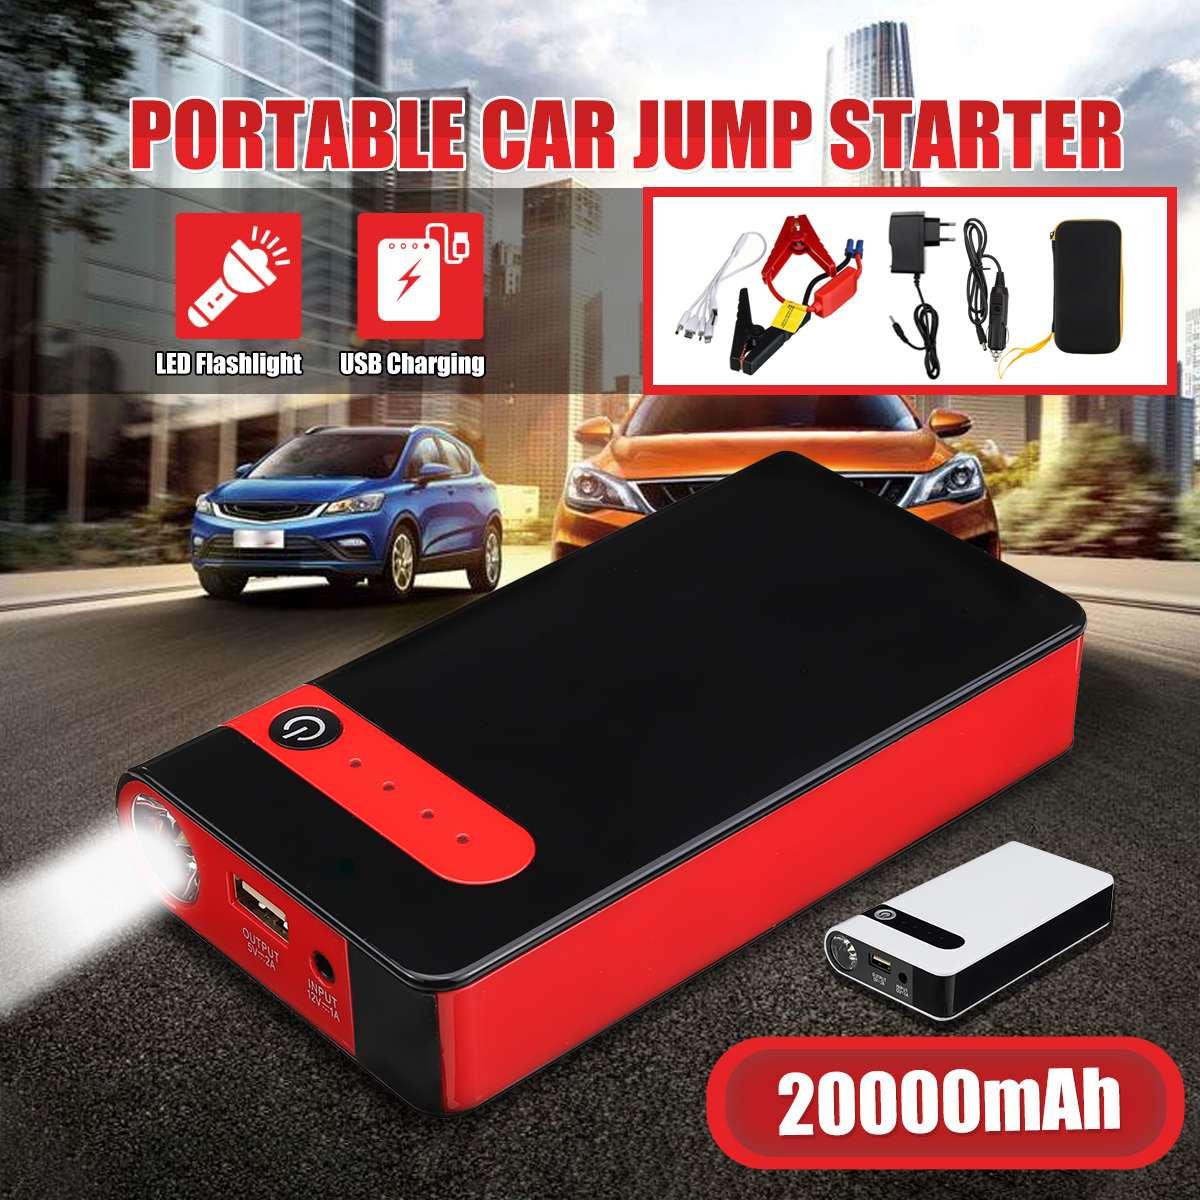 20000mAh Jump Starter 12V Car Jump Starter Starting Device Power Bank Emergency Car Battery Booster Buster Jump Starter